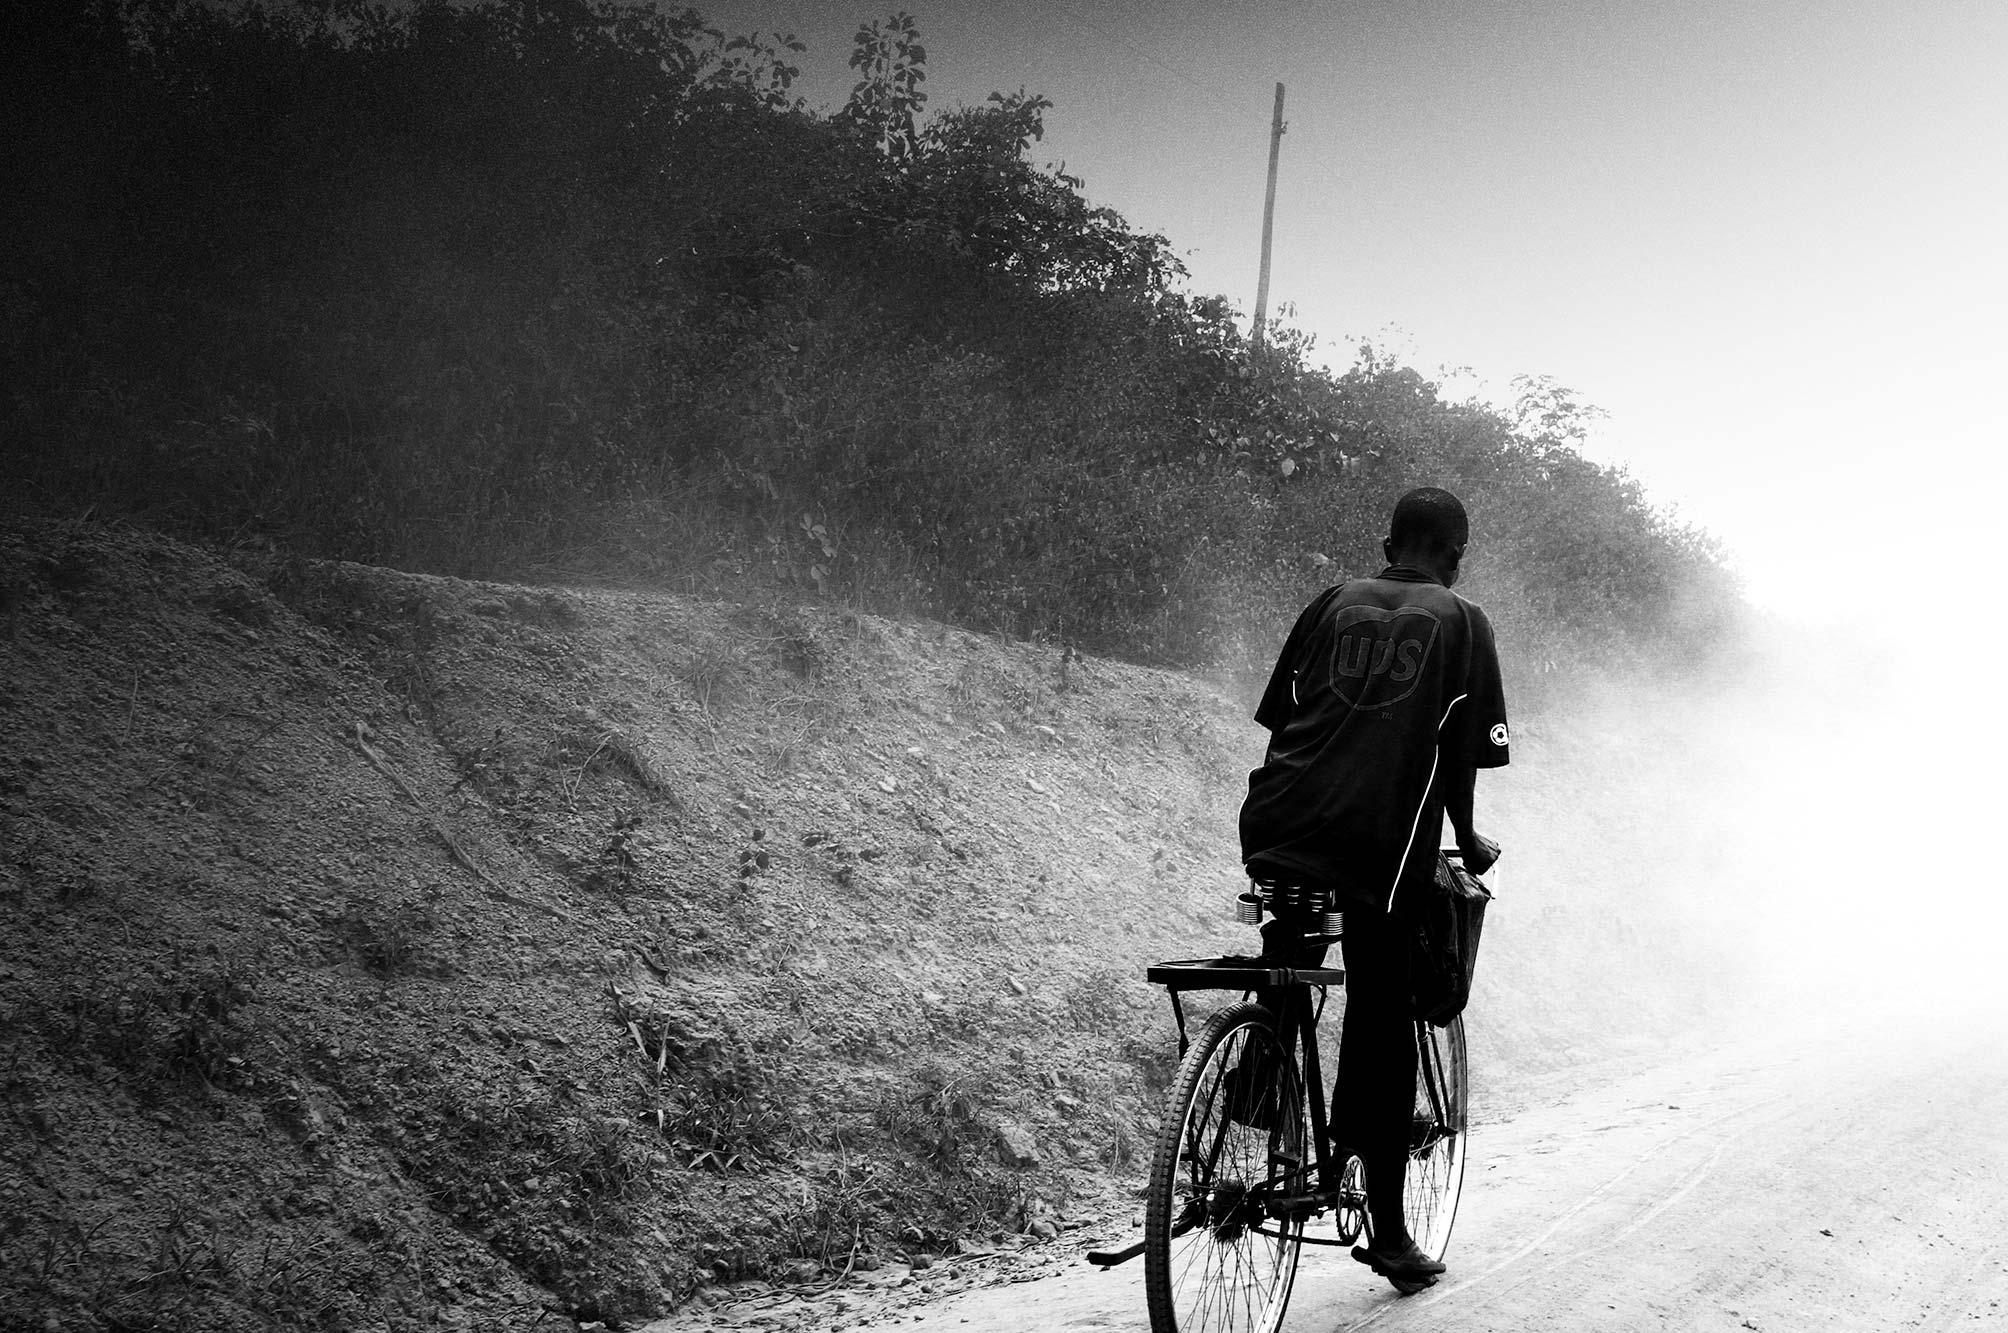 Uganda man on bicycle with UPS shirt on